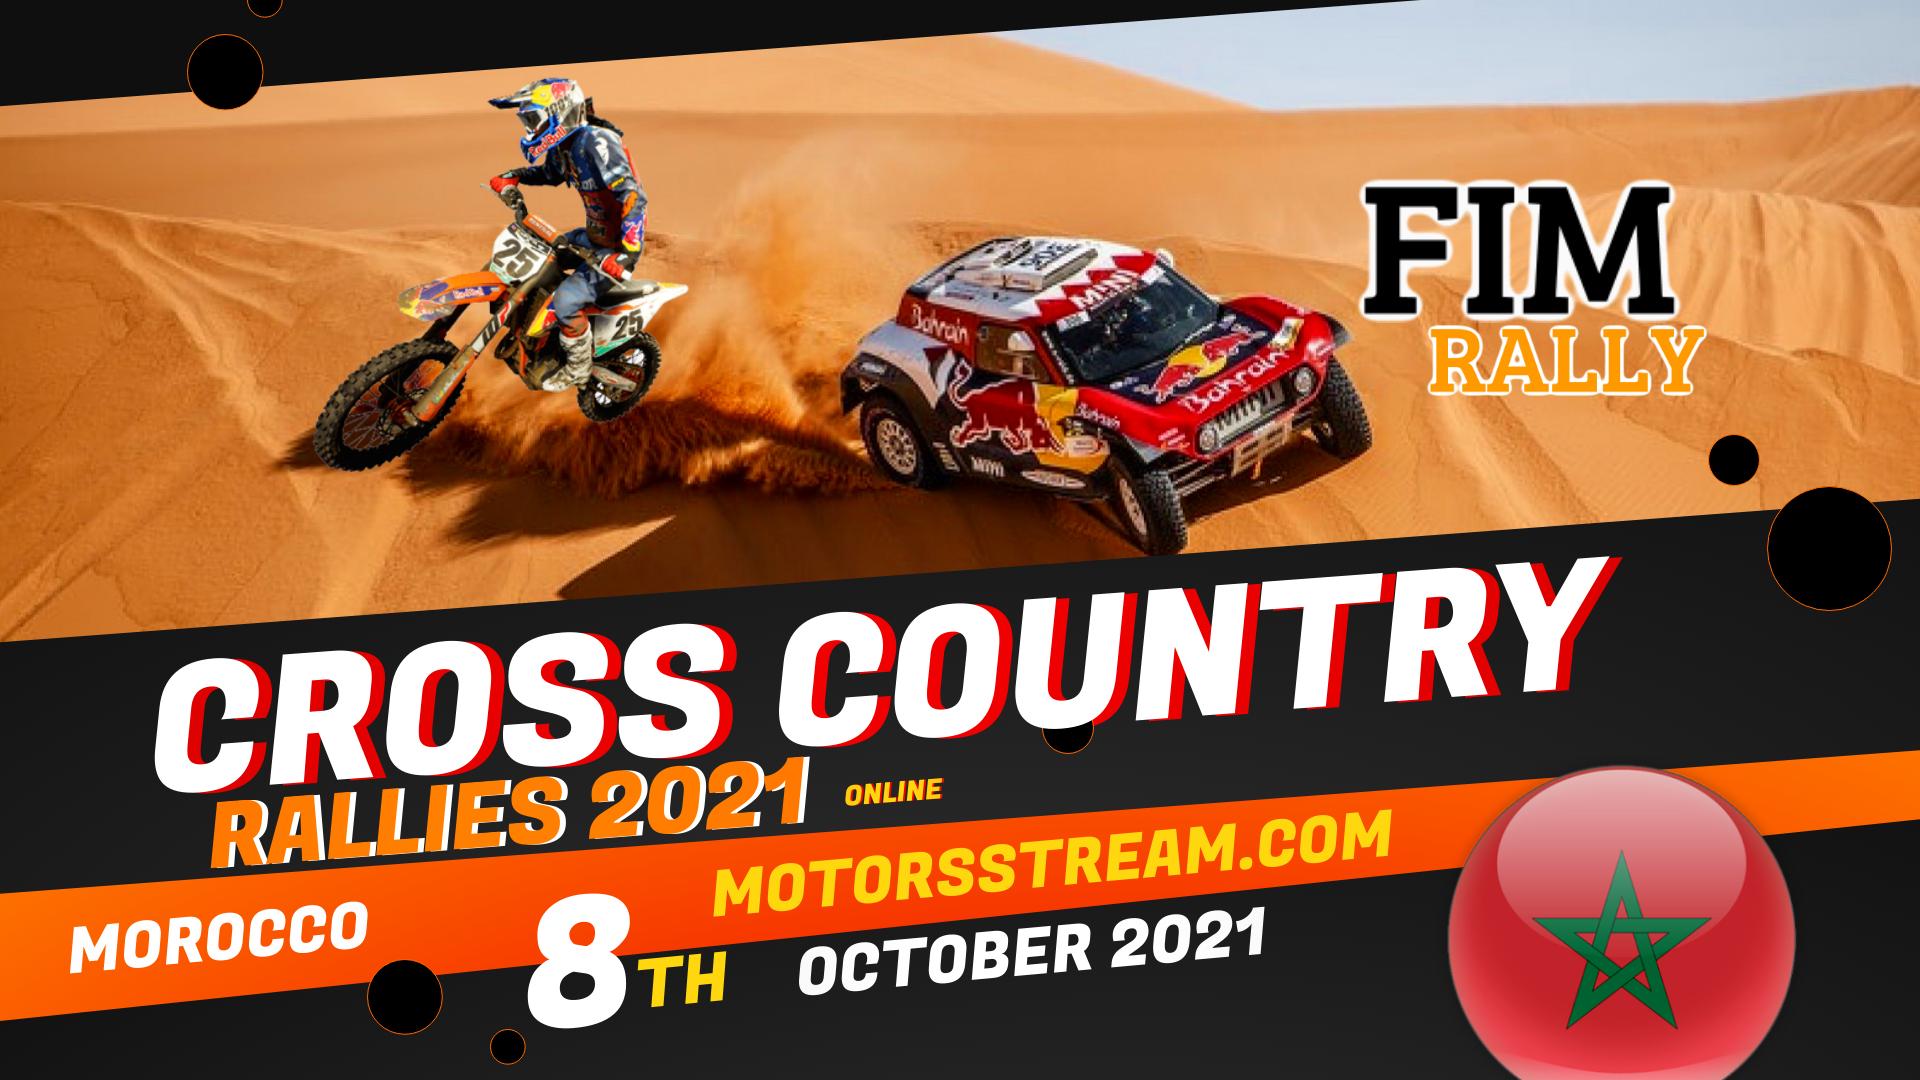 Morocco Cross Country Rallies Live Stream 2021